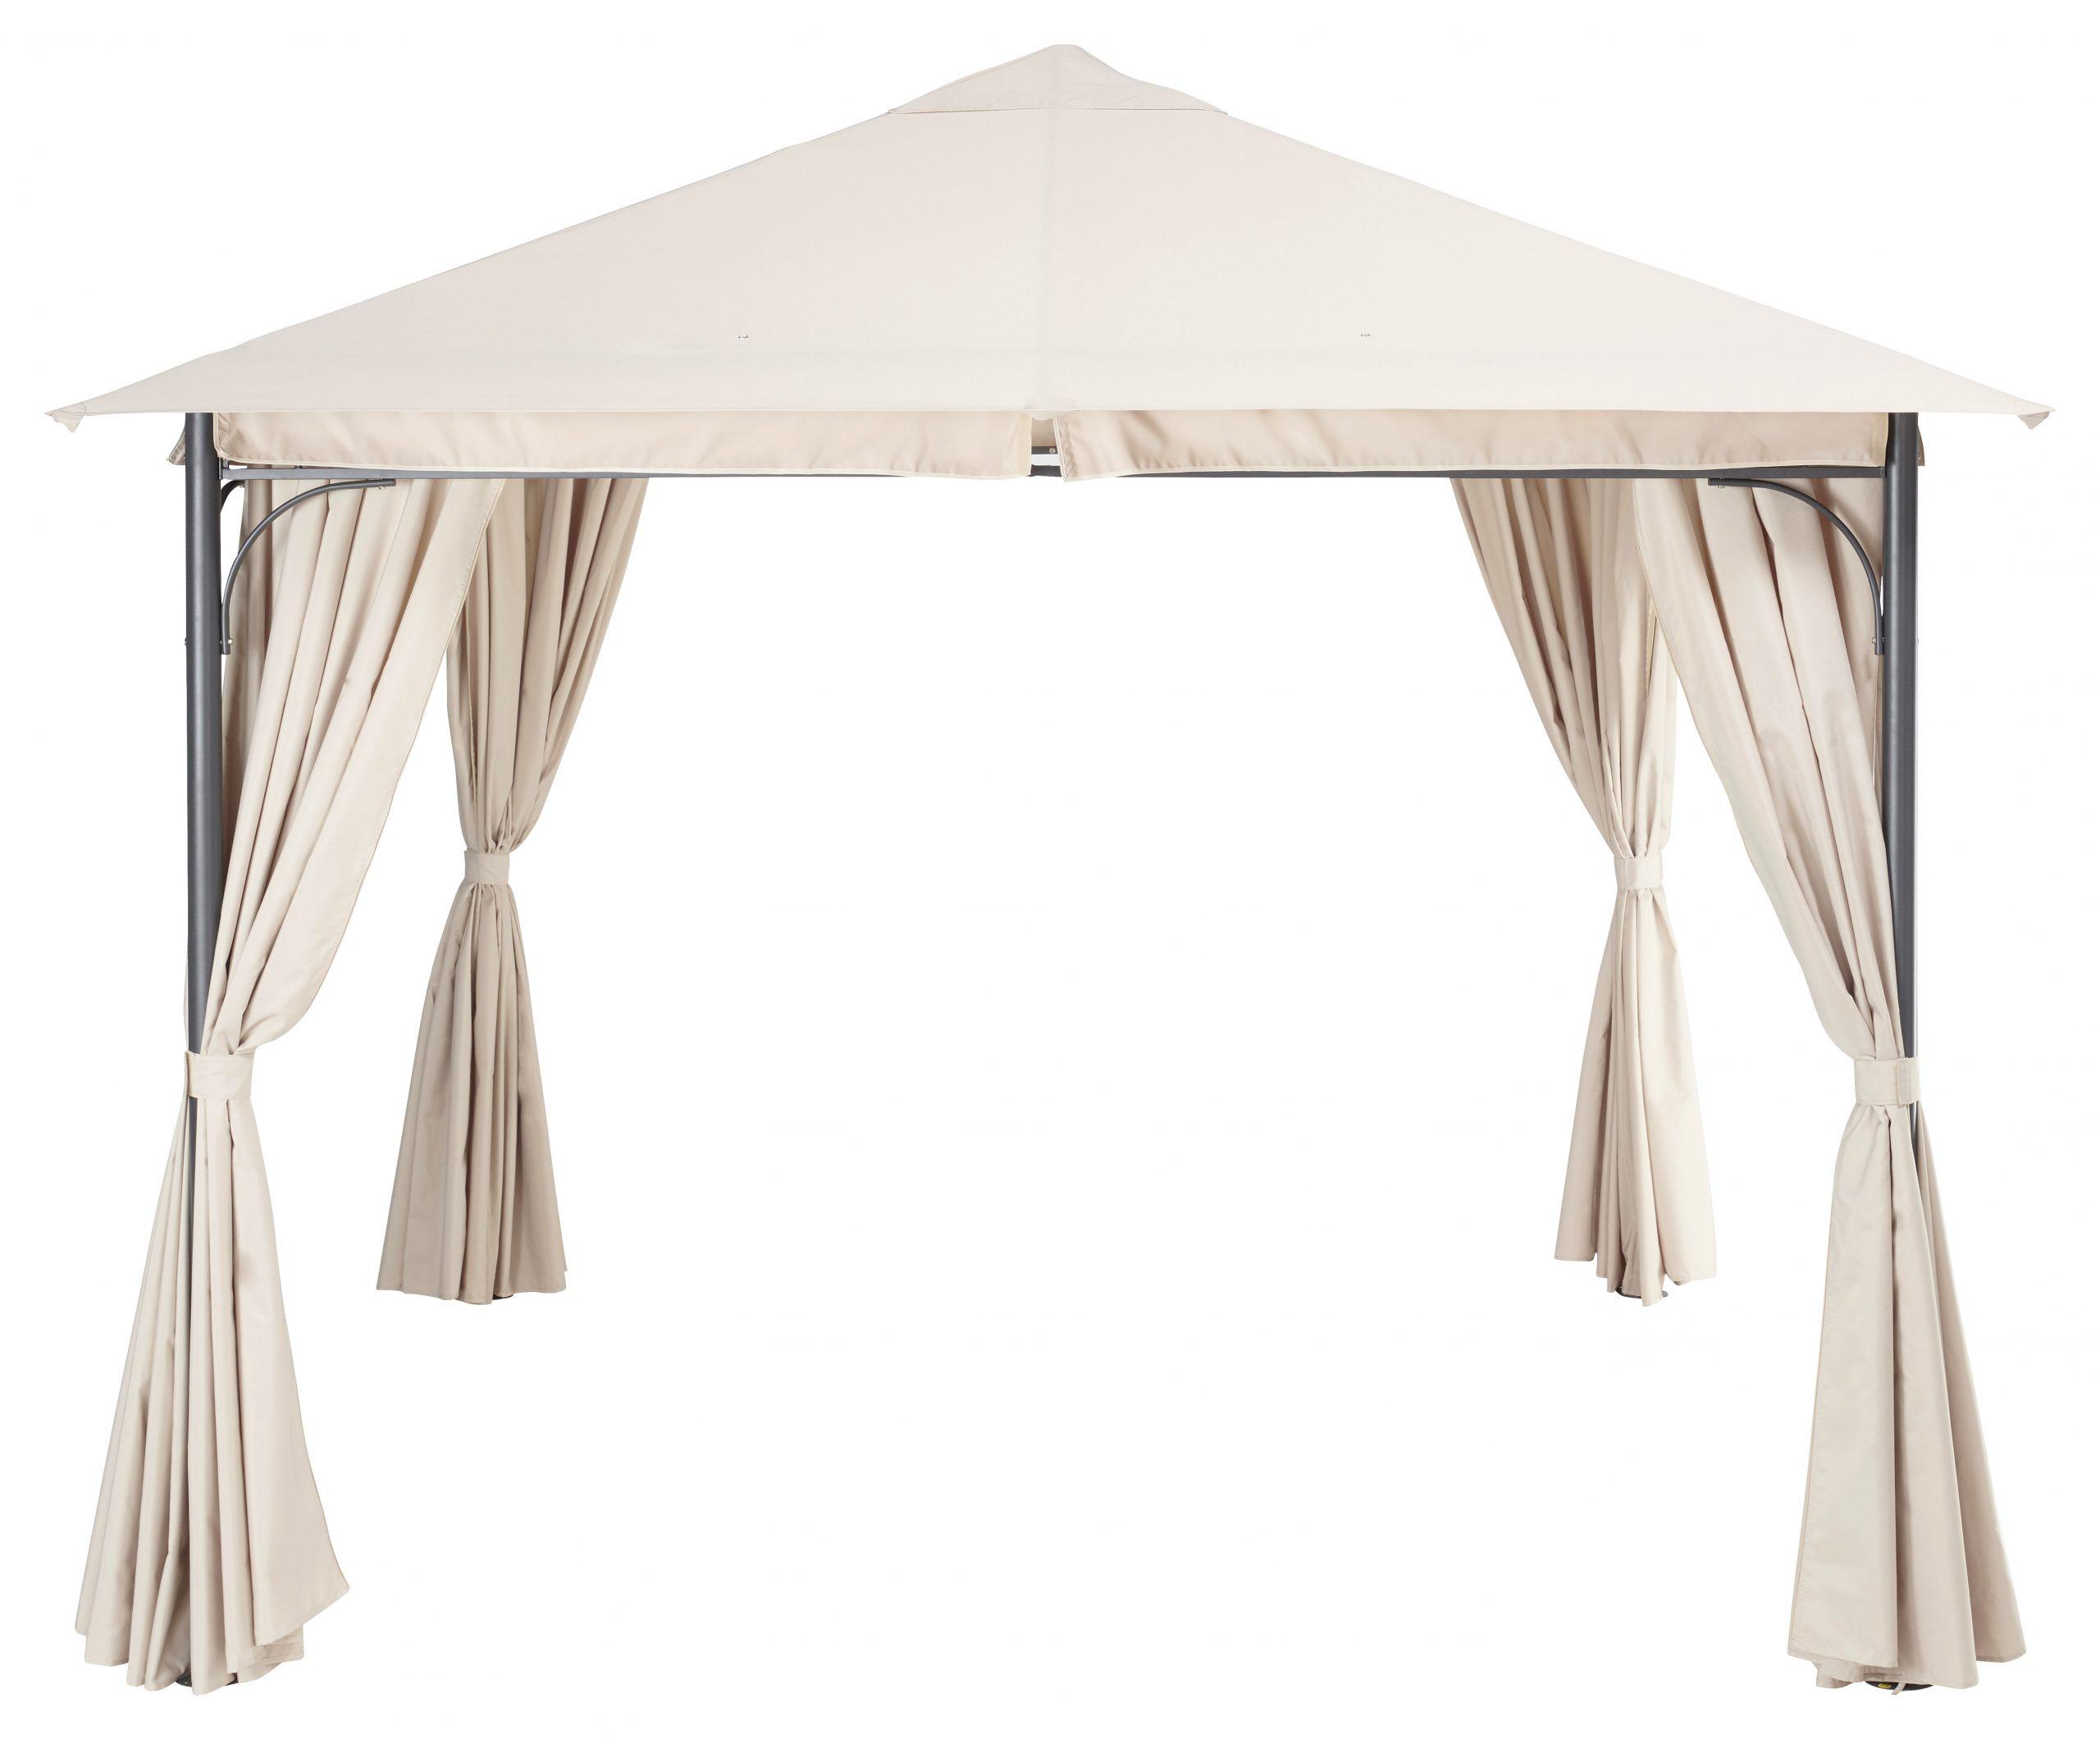 Tenda Carrefour